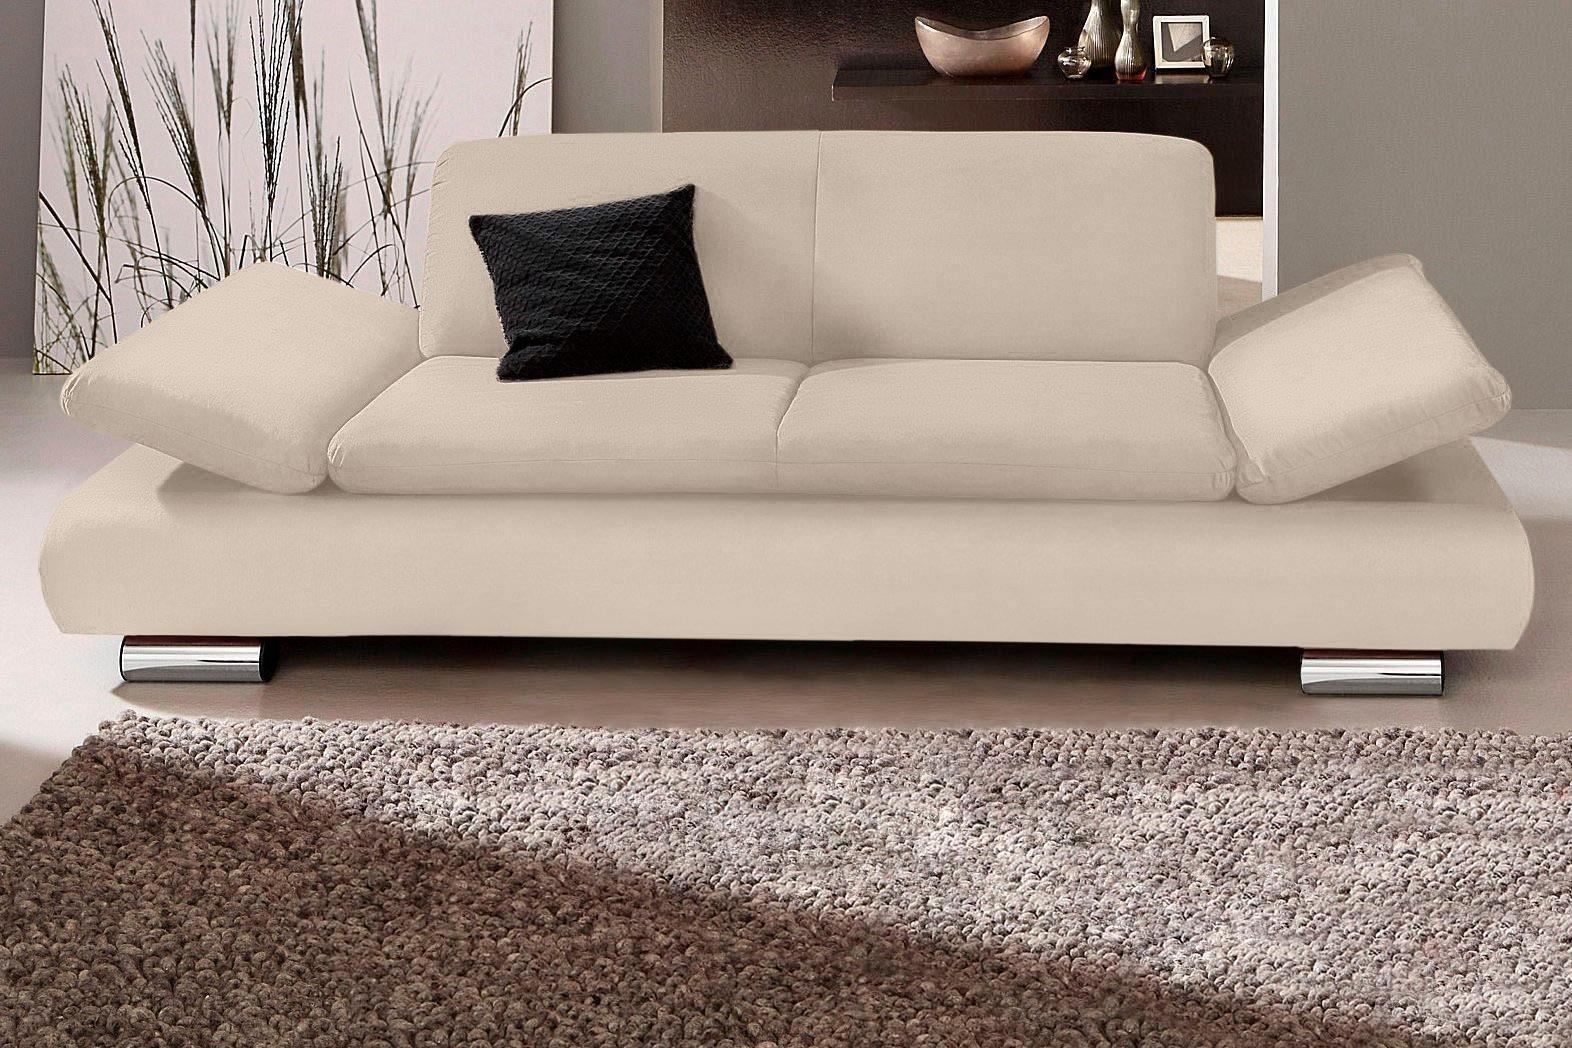 20 sparen 2 sitzer sofa toulouse von max winzer ab. Black Bedroom Furniture Sets. Home Design Ideas